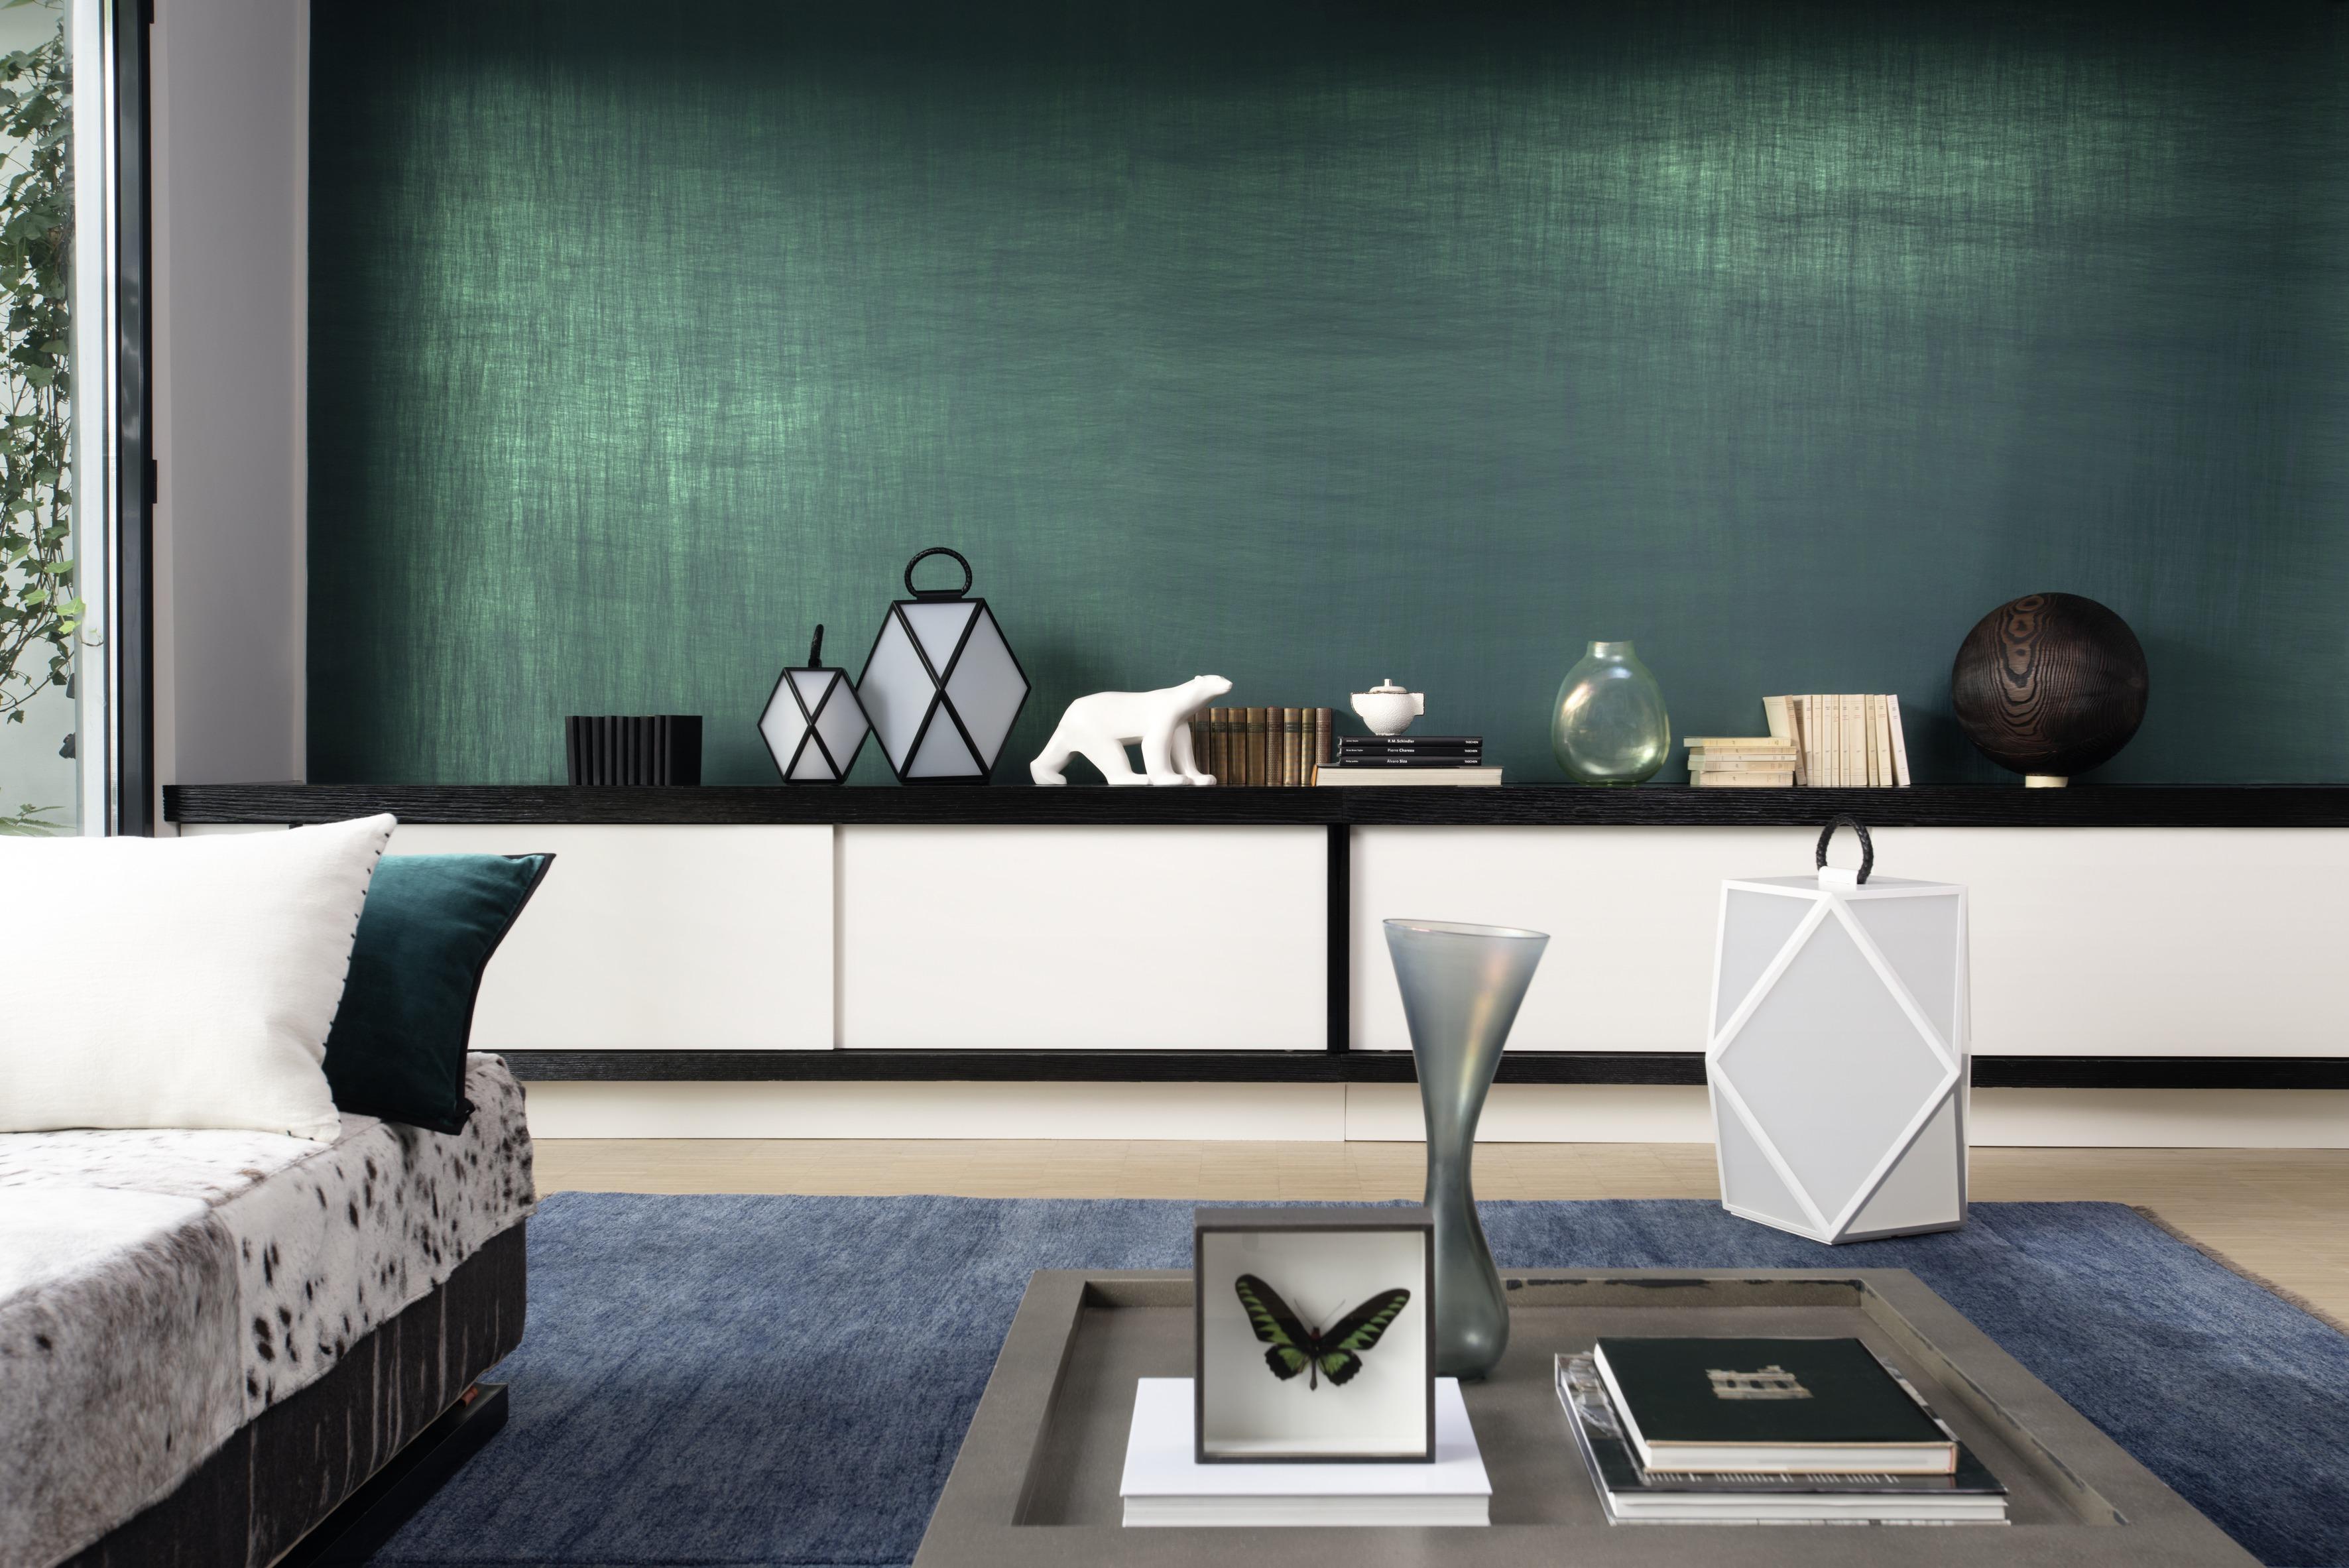 hochwertige tapeten exlusiv bei hans g bock in hannover. Black Bedroom Furniture Sets. Home Design Ideas